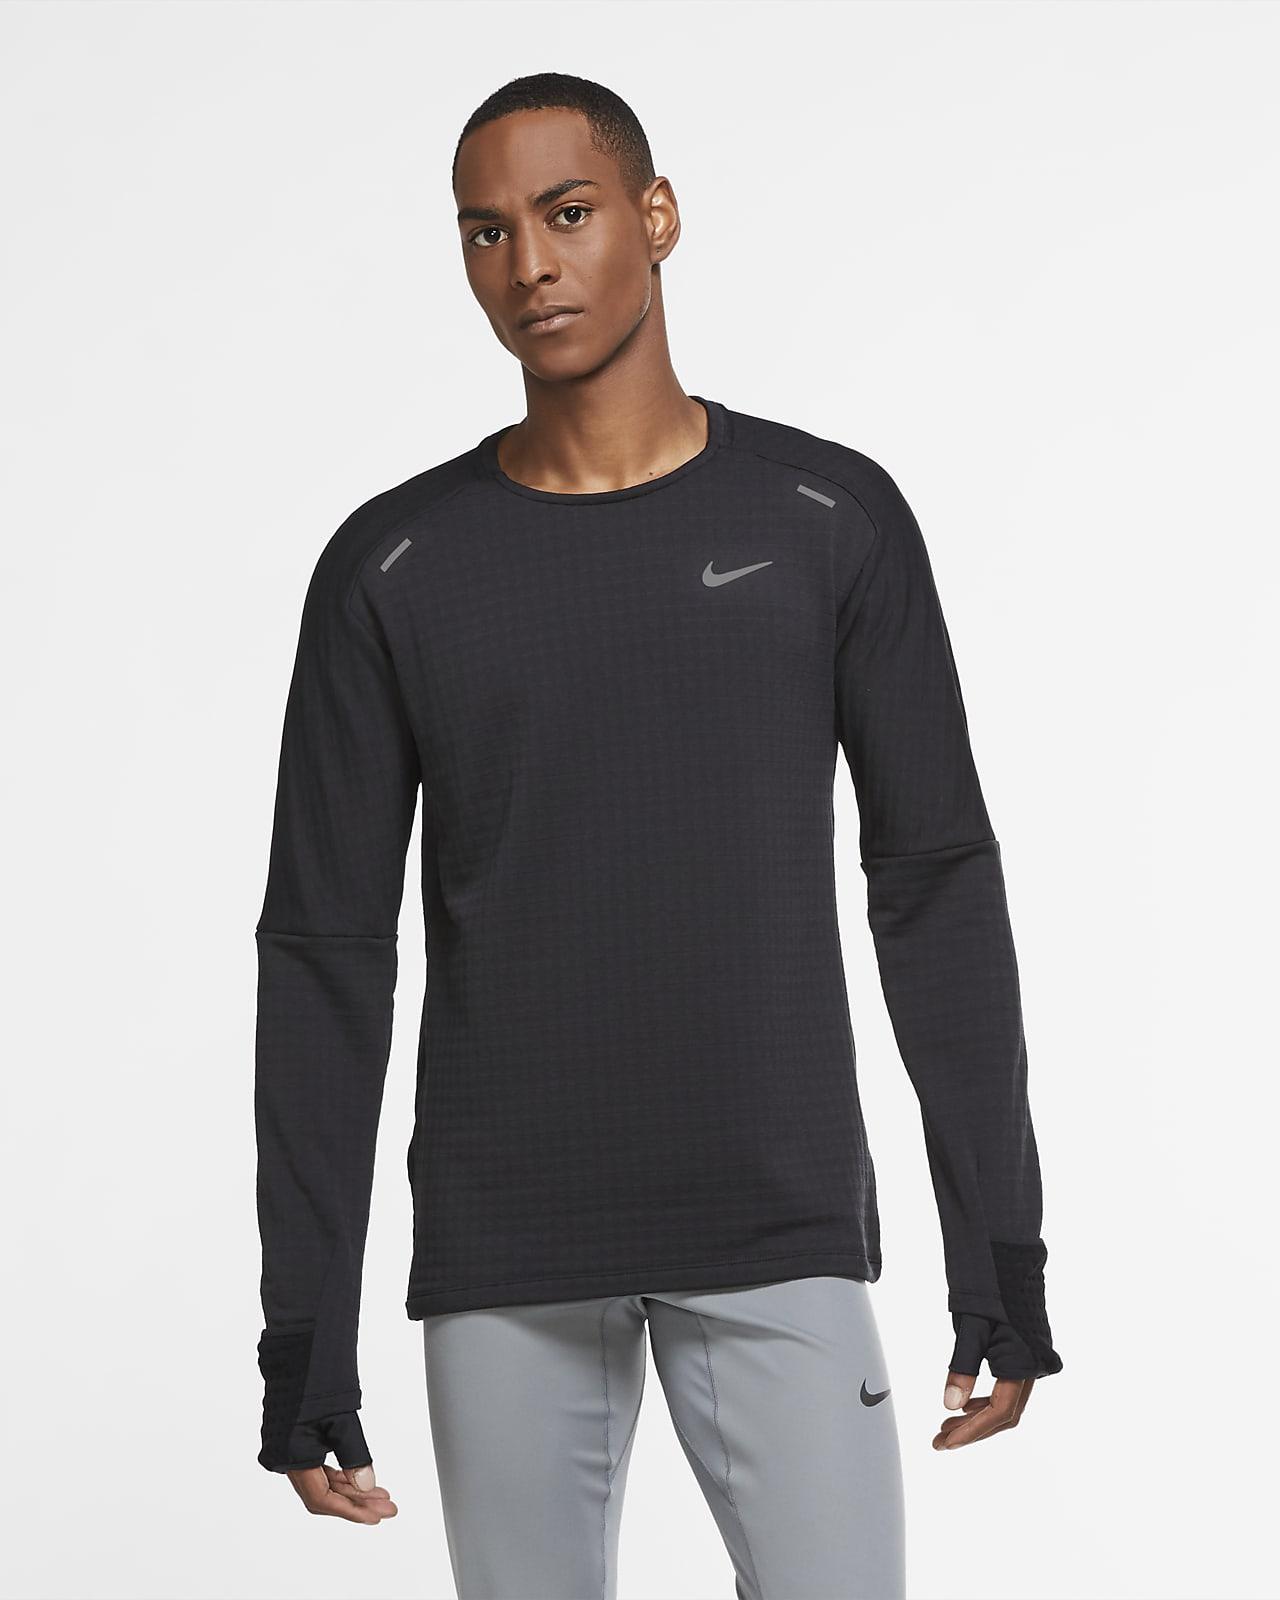 Nike Sphere Camiseta de running con cuello redondo - Hombre